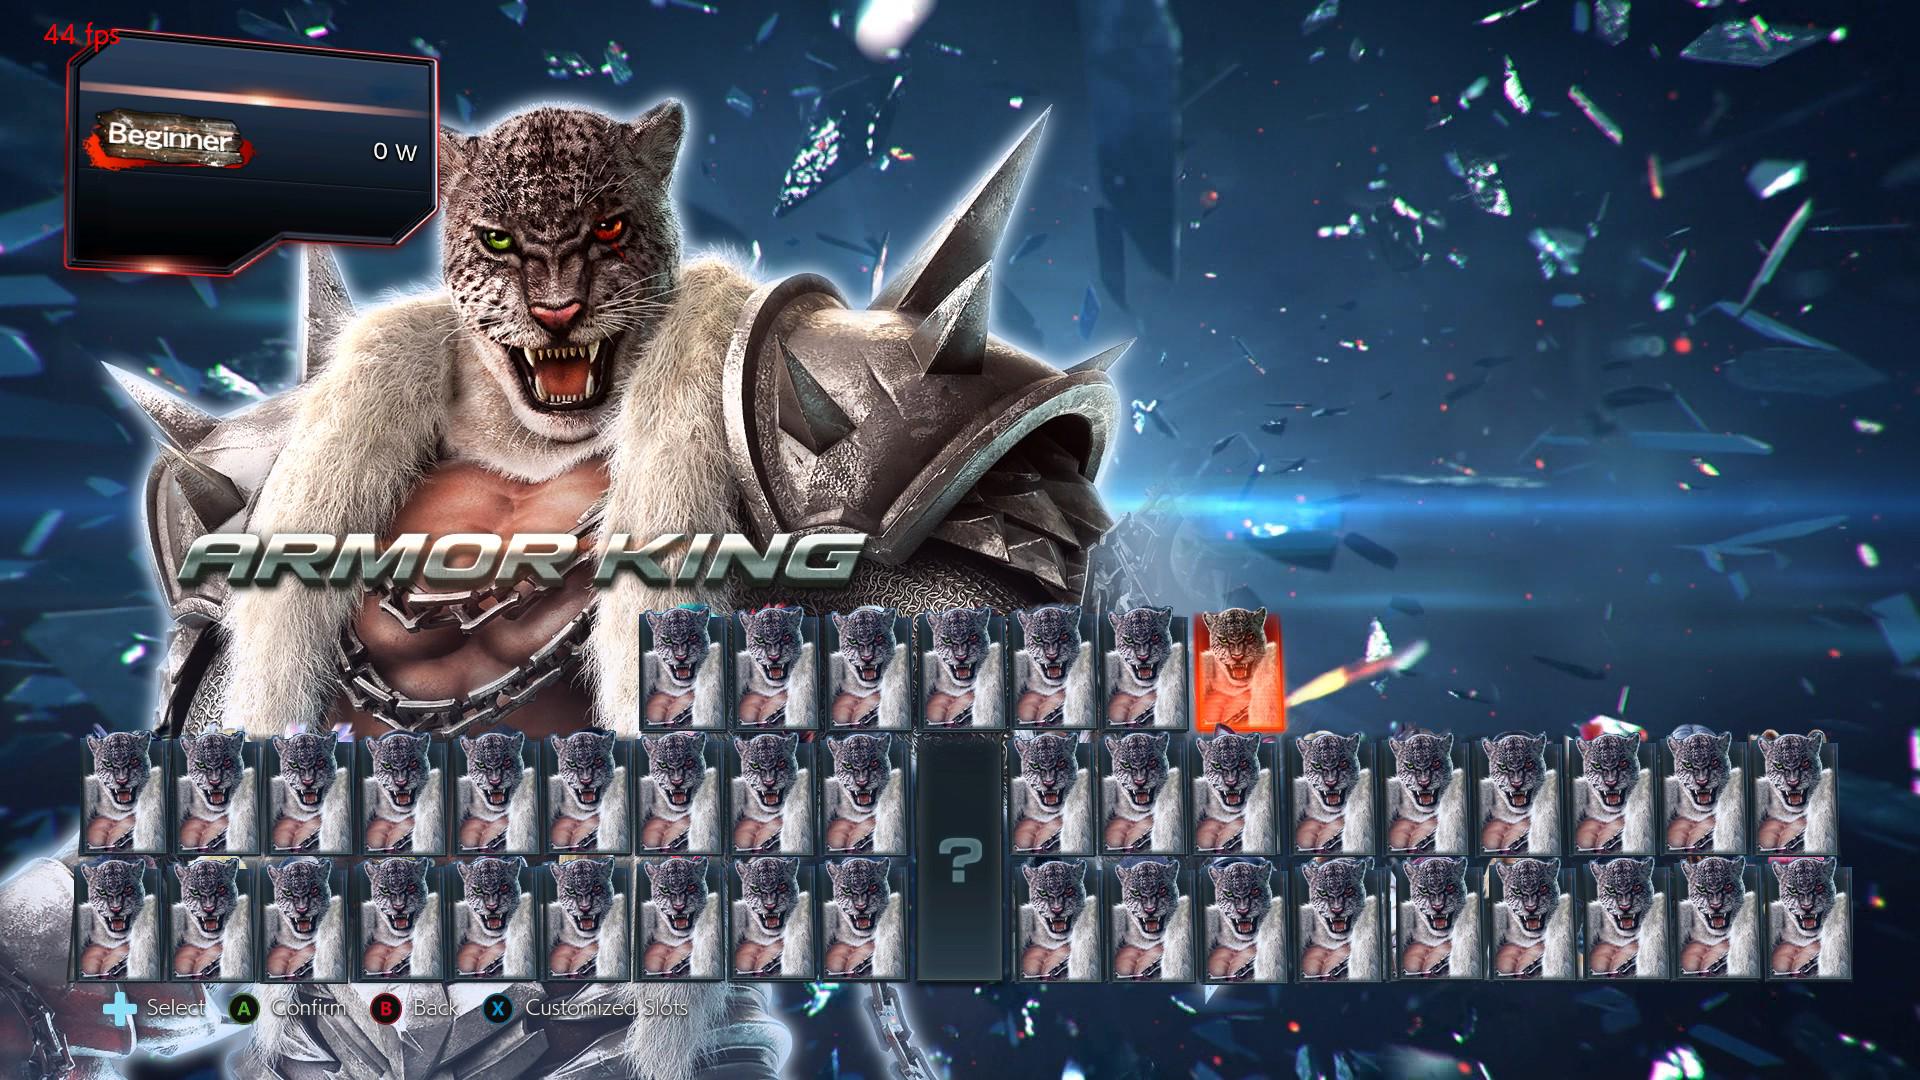 Tekken King Wallpaper 1920x1080 Wallpaper Teahub Io